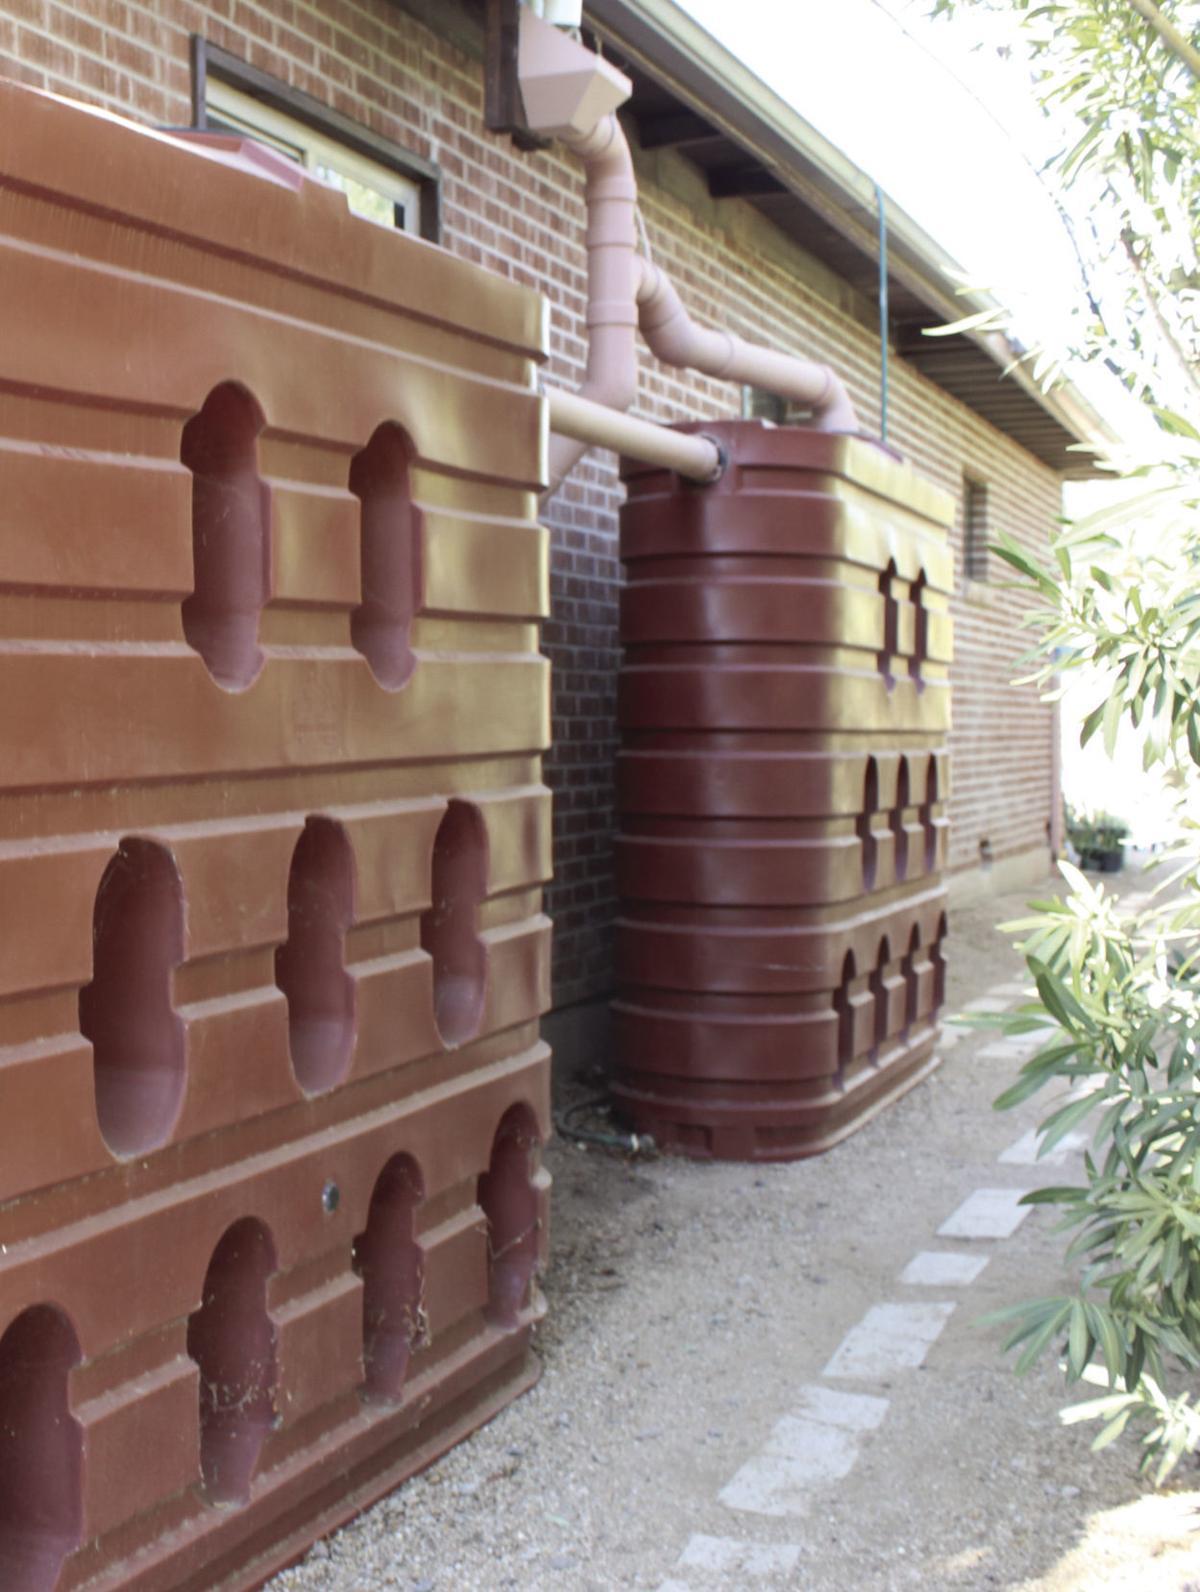 Active rainwater harvesting